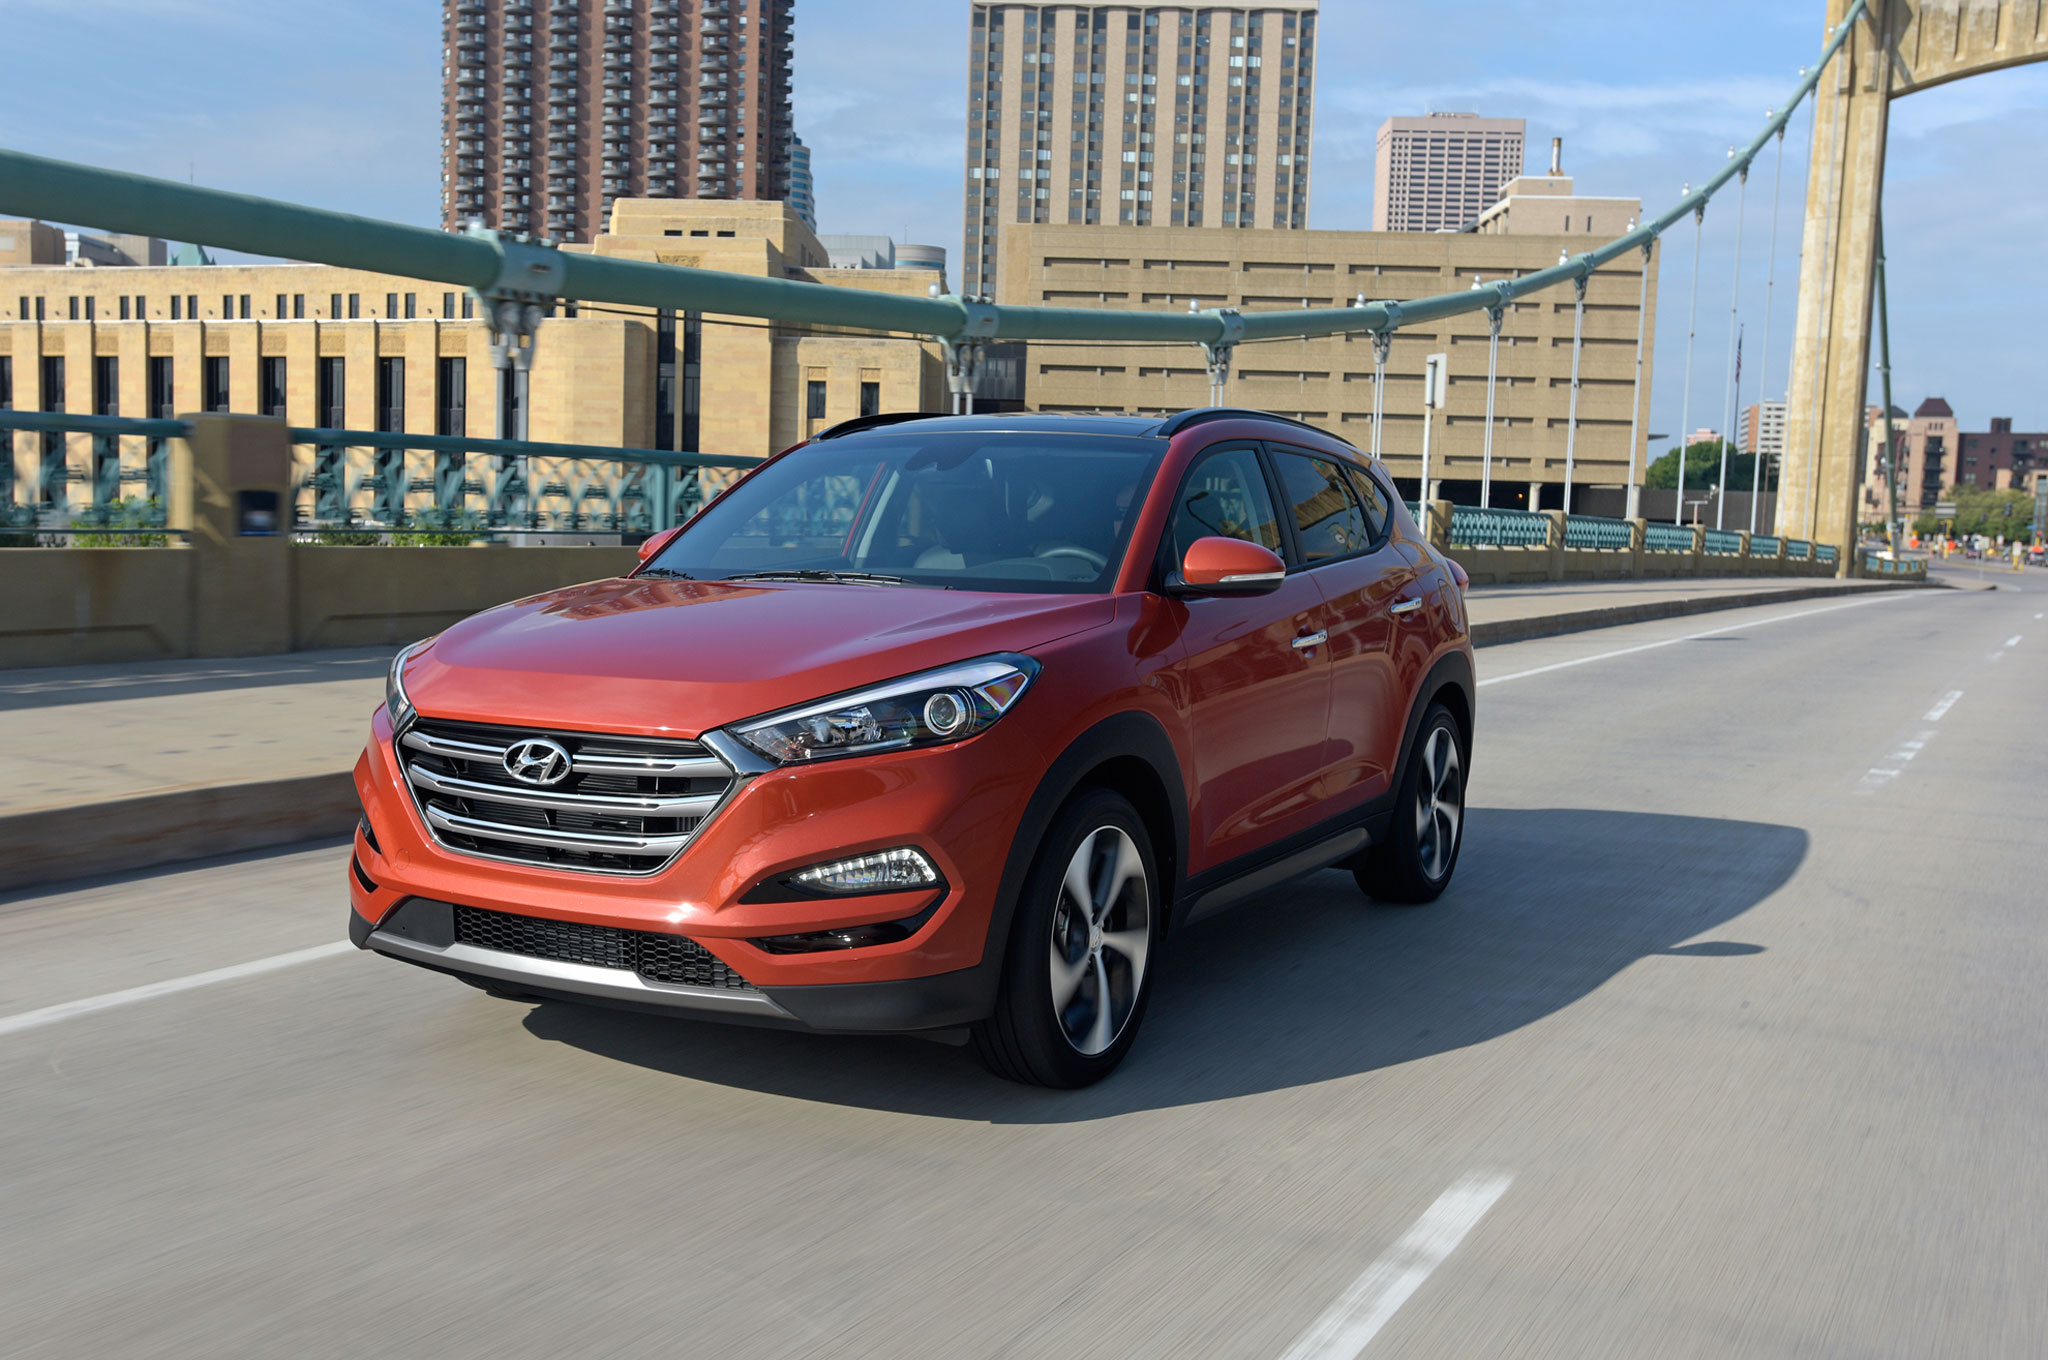 2016 Hyundai Tucson Lead